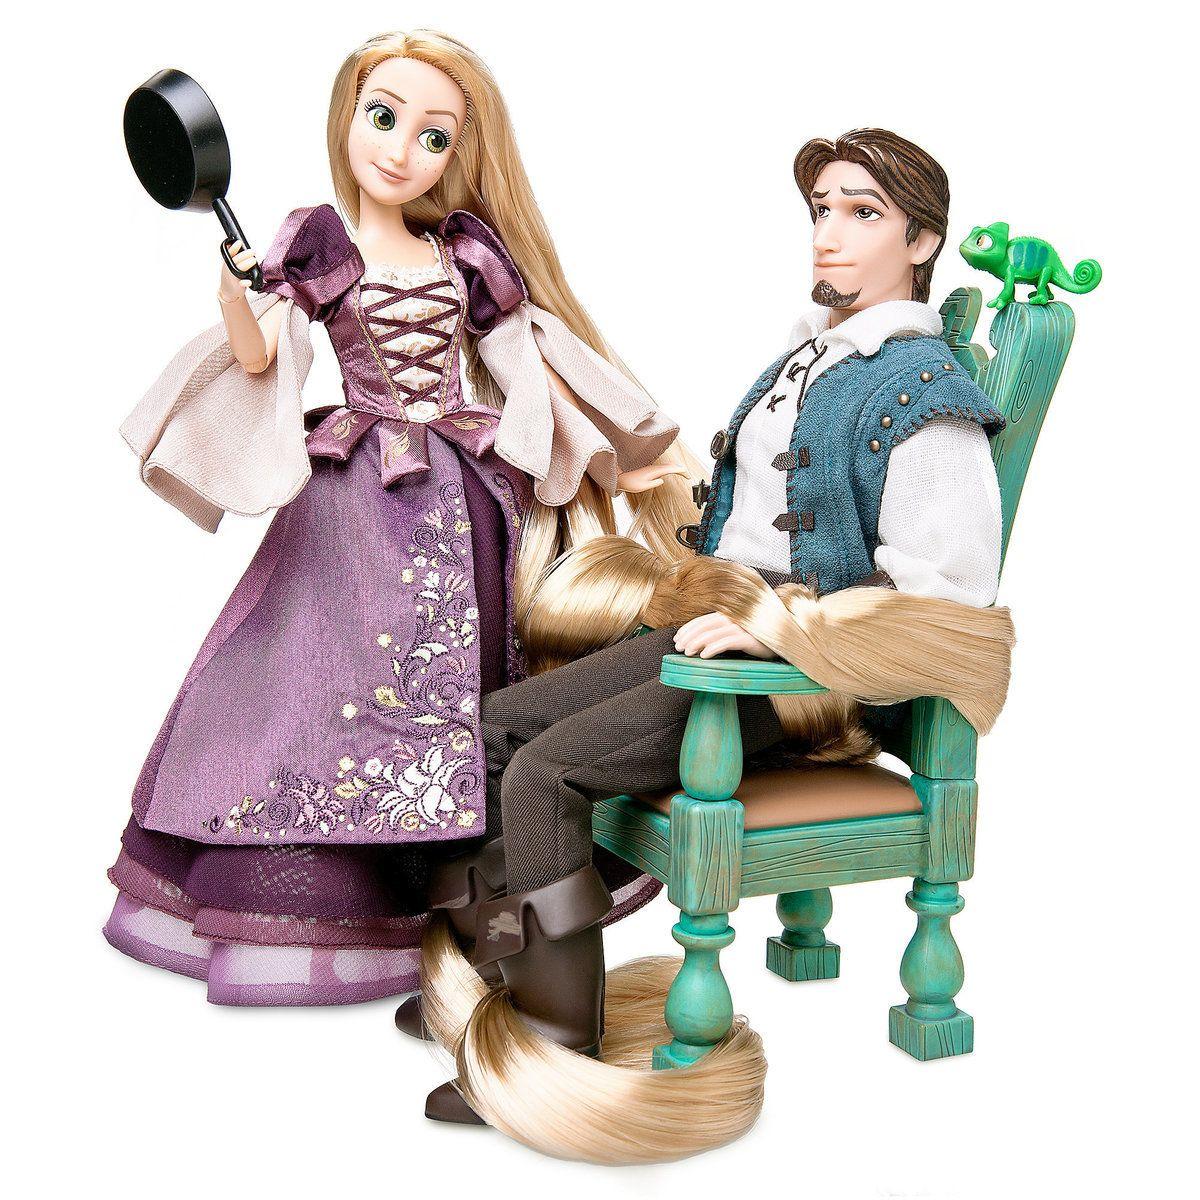 Disney Designer Doll Collection Rapunzel And Flynn Fairytale Series Rapunzel Features Signature Golden H Disney Rapunzel Disney Dolls Disney Princess Dolls